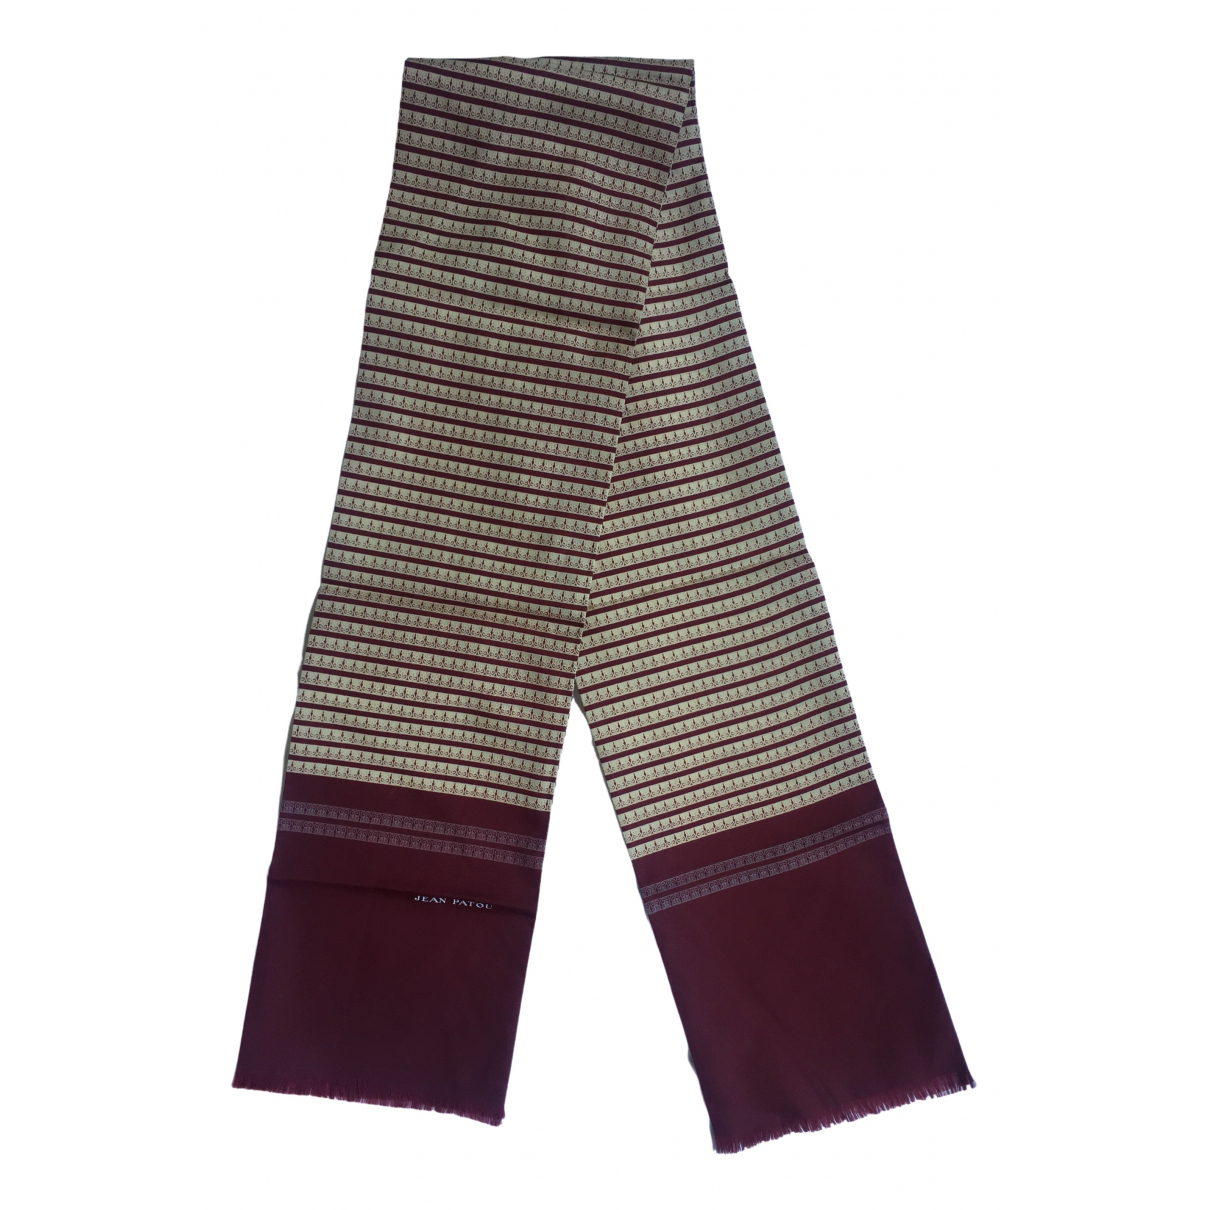 Jean Patou \N Burgundy scarf & pocket squares for Men \N